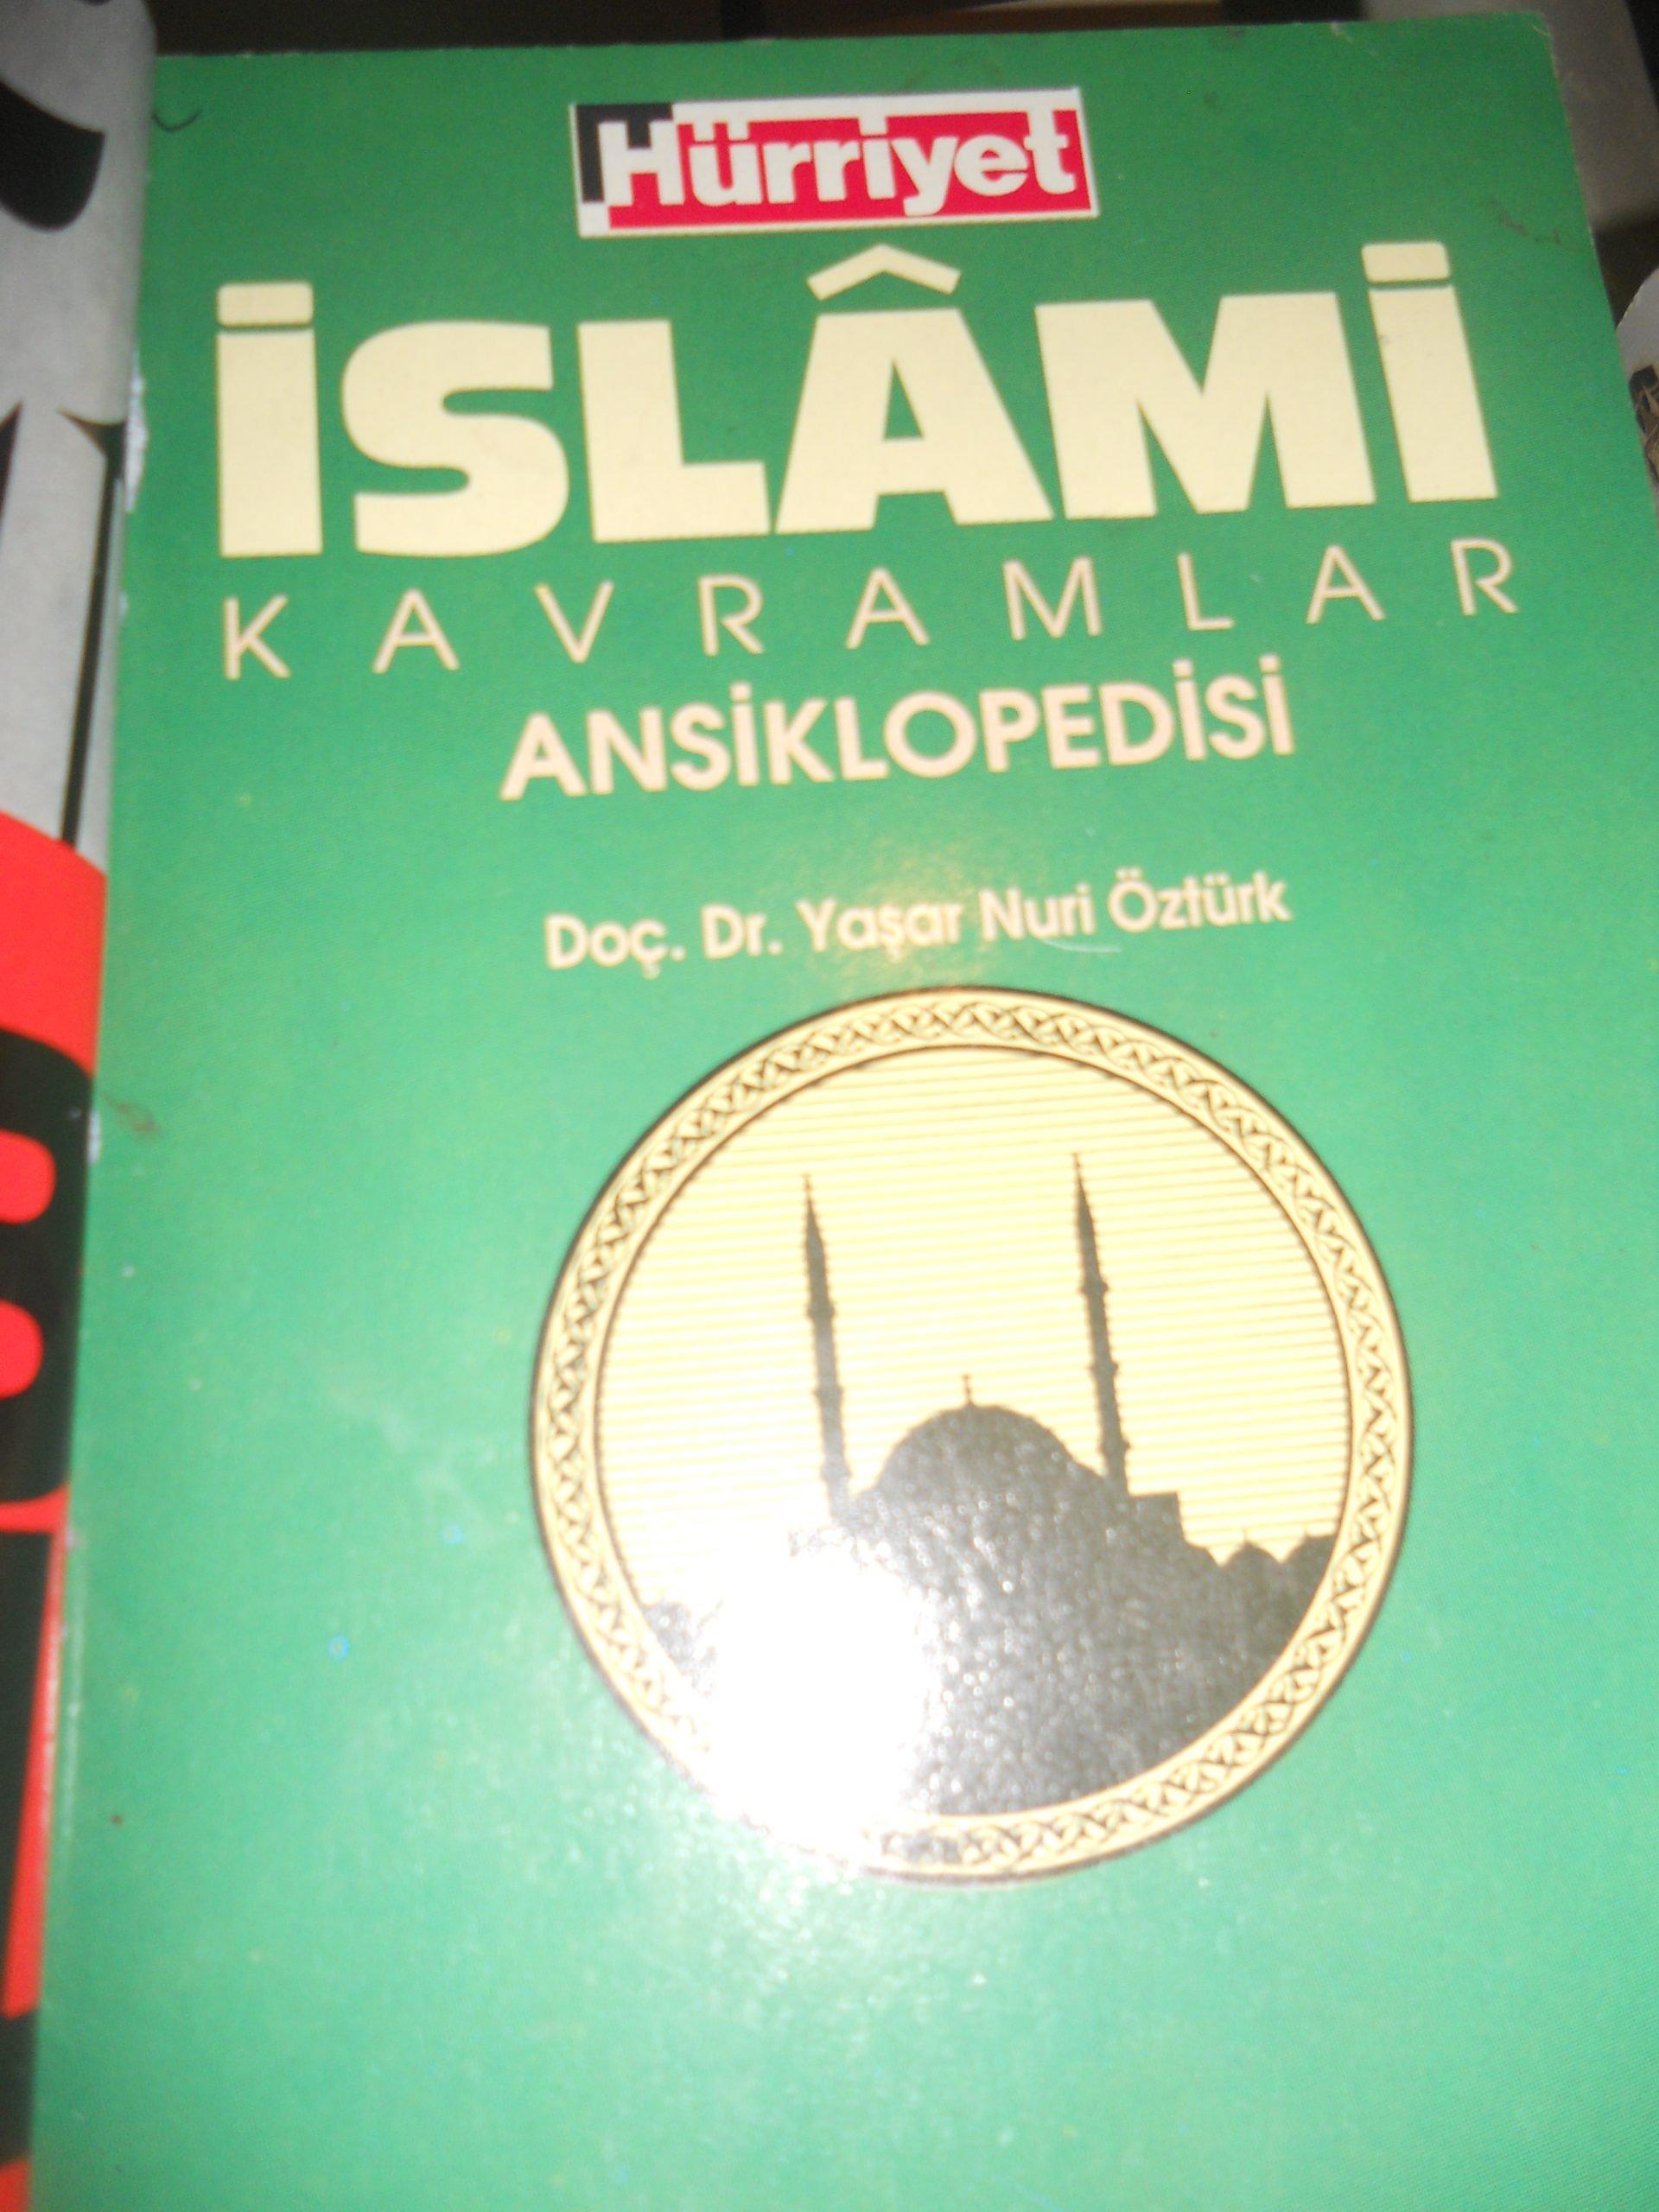 İSLAMİ KAVRAMLAR ANSIKLOPEDİSİ/Yaşar Nuri Öztürk